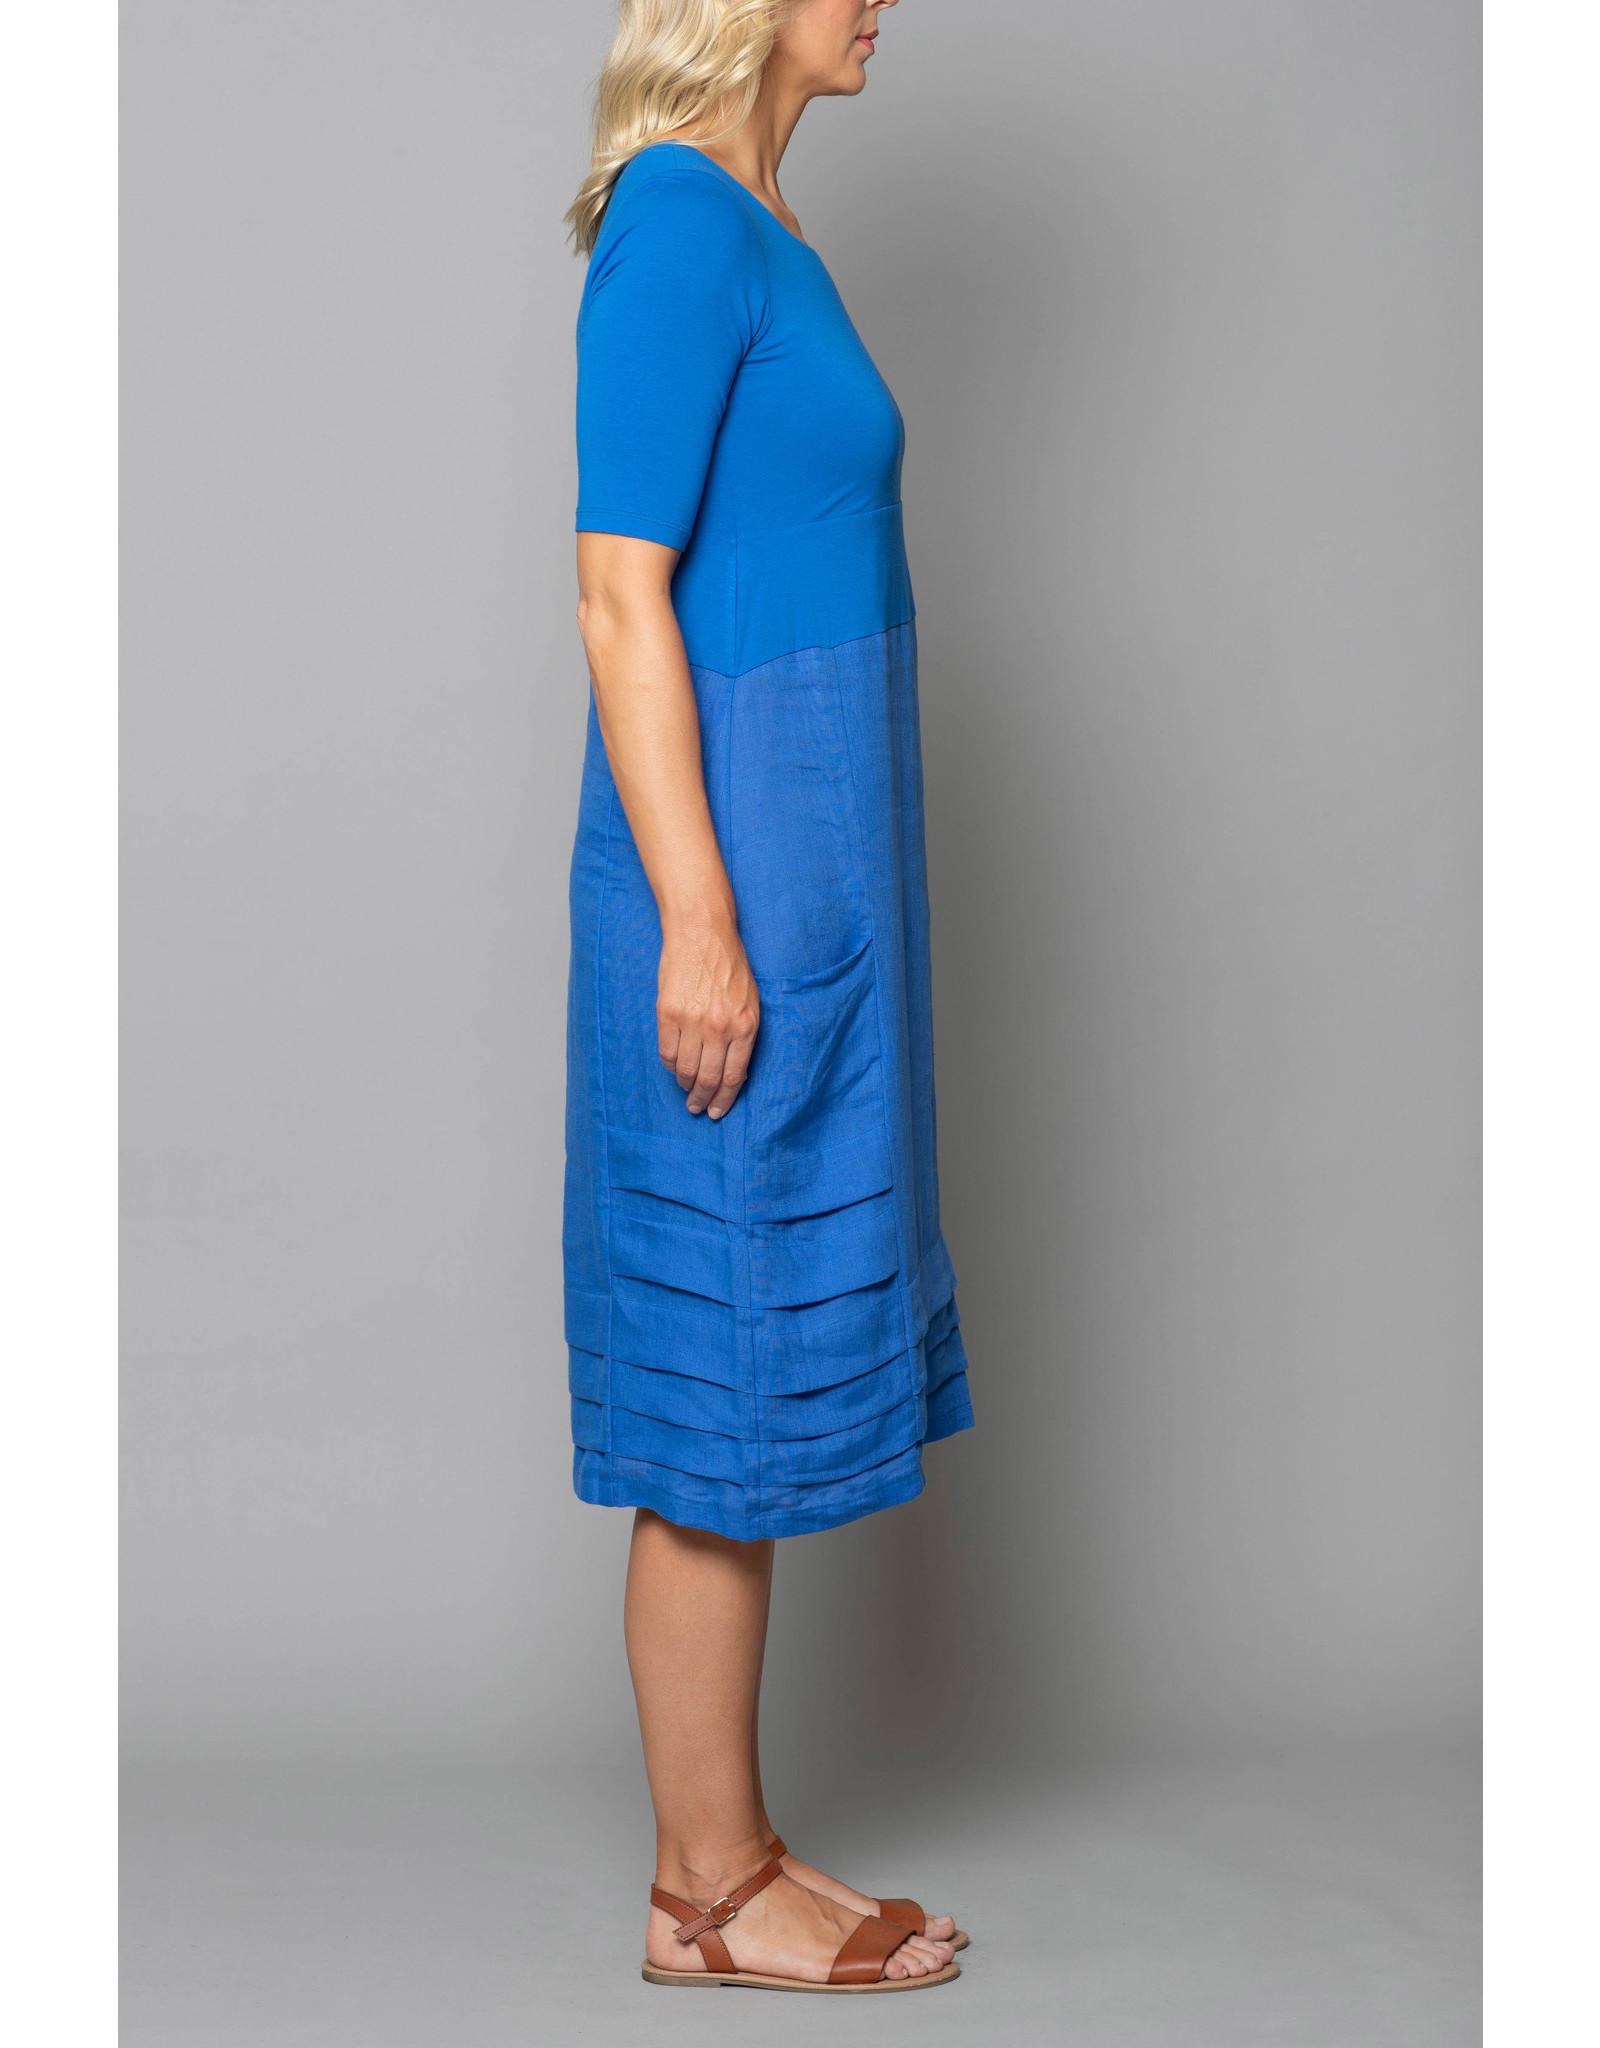 Peruzzi Pleated Linen Dress